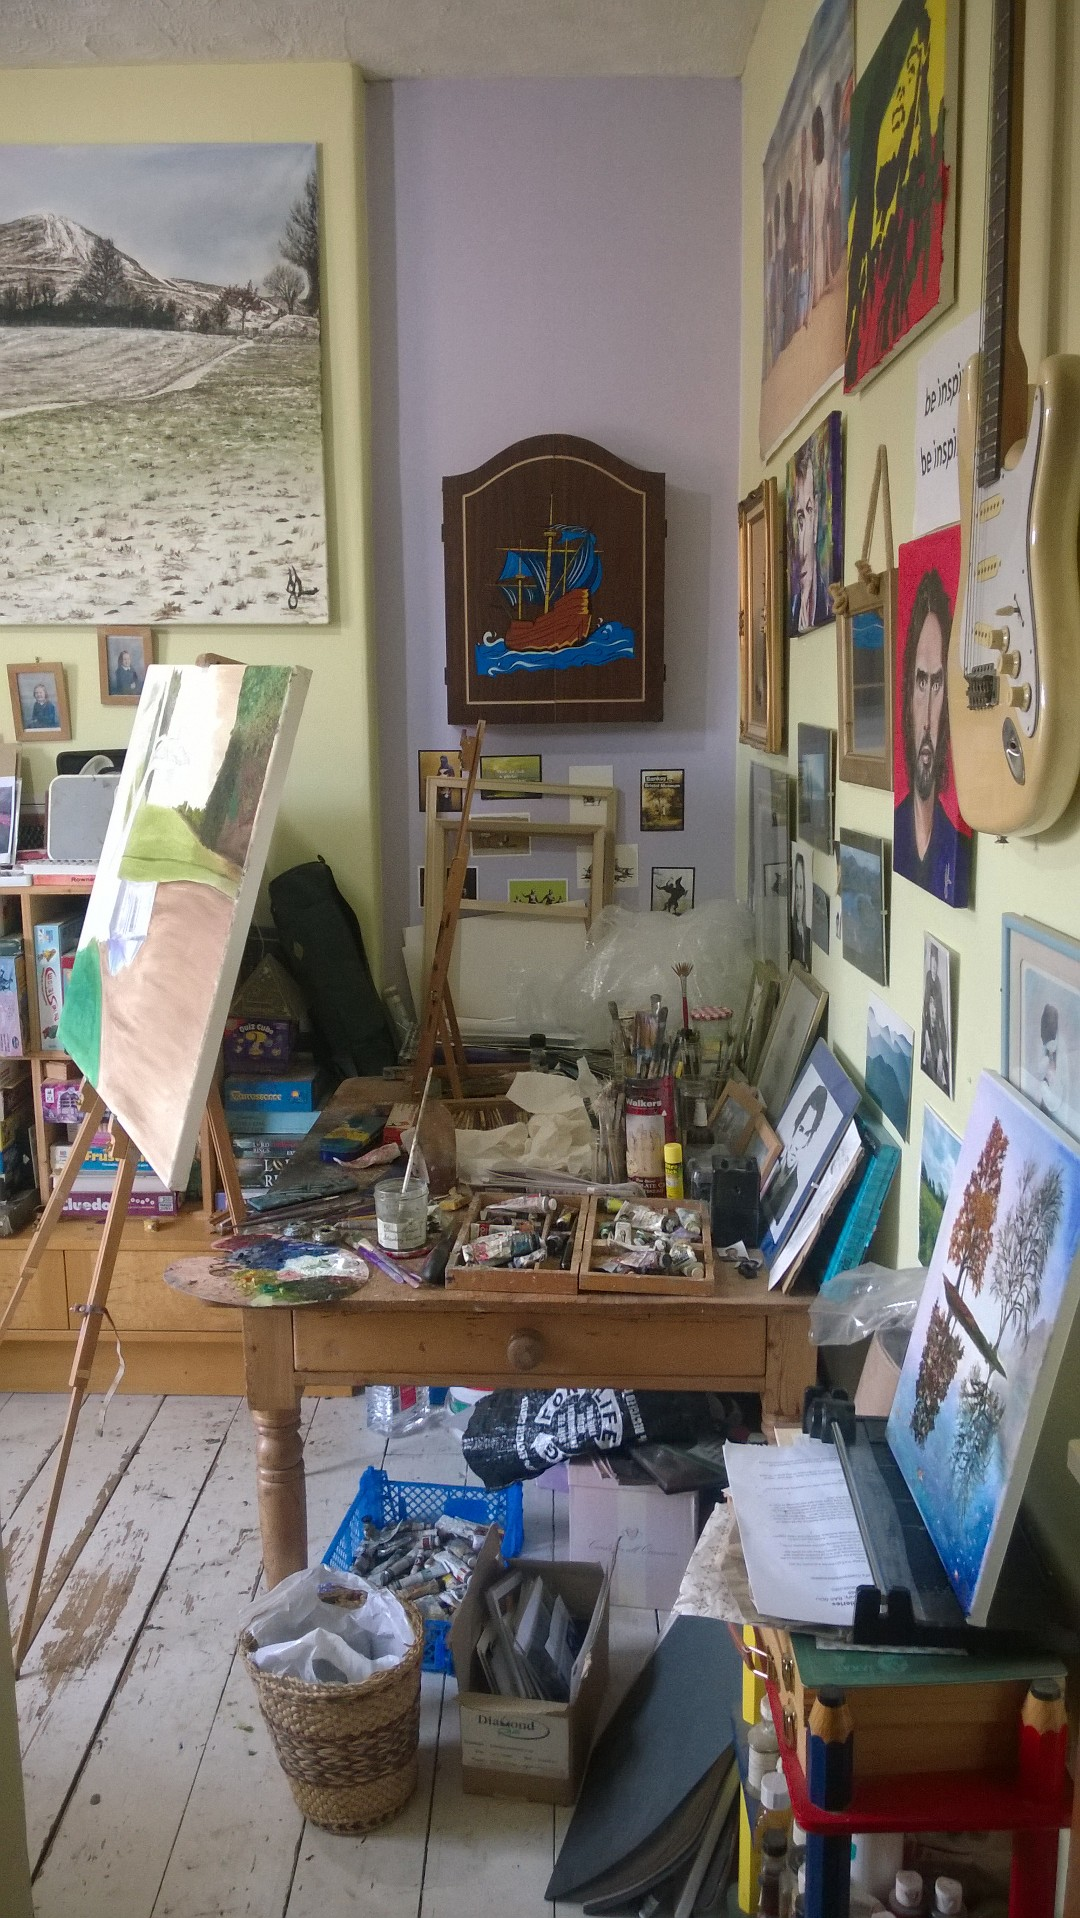 Julie's Studio in Glastonbury